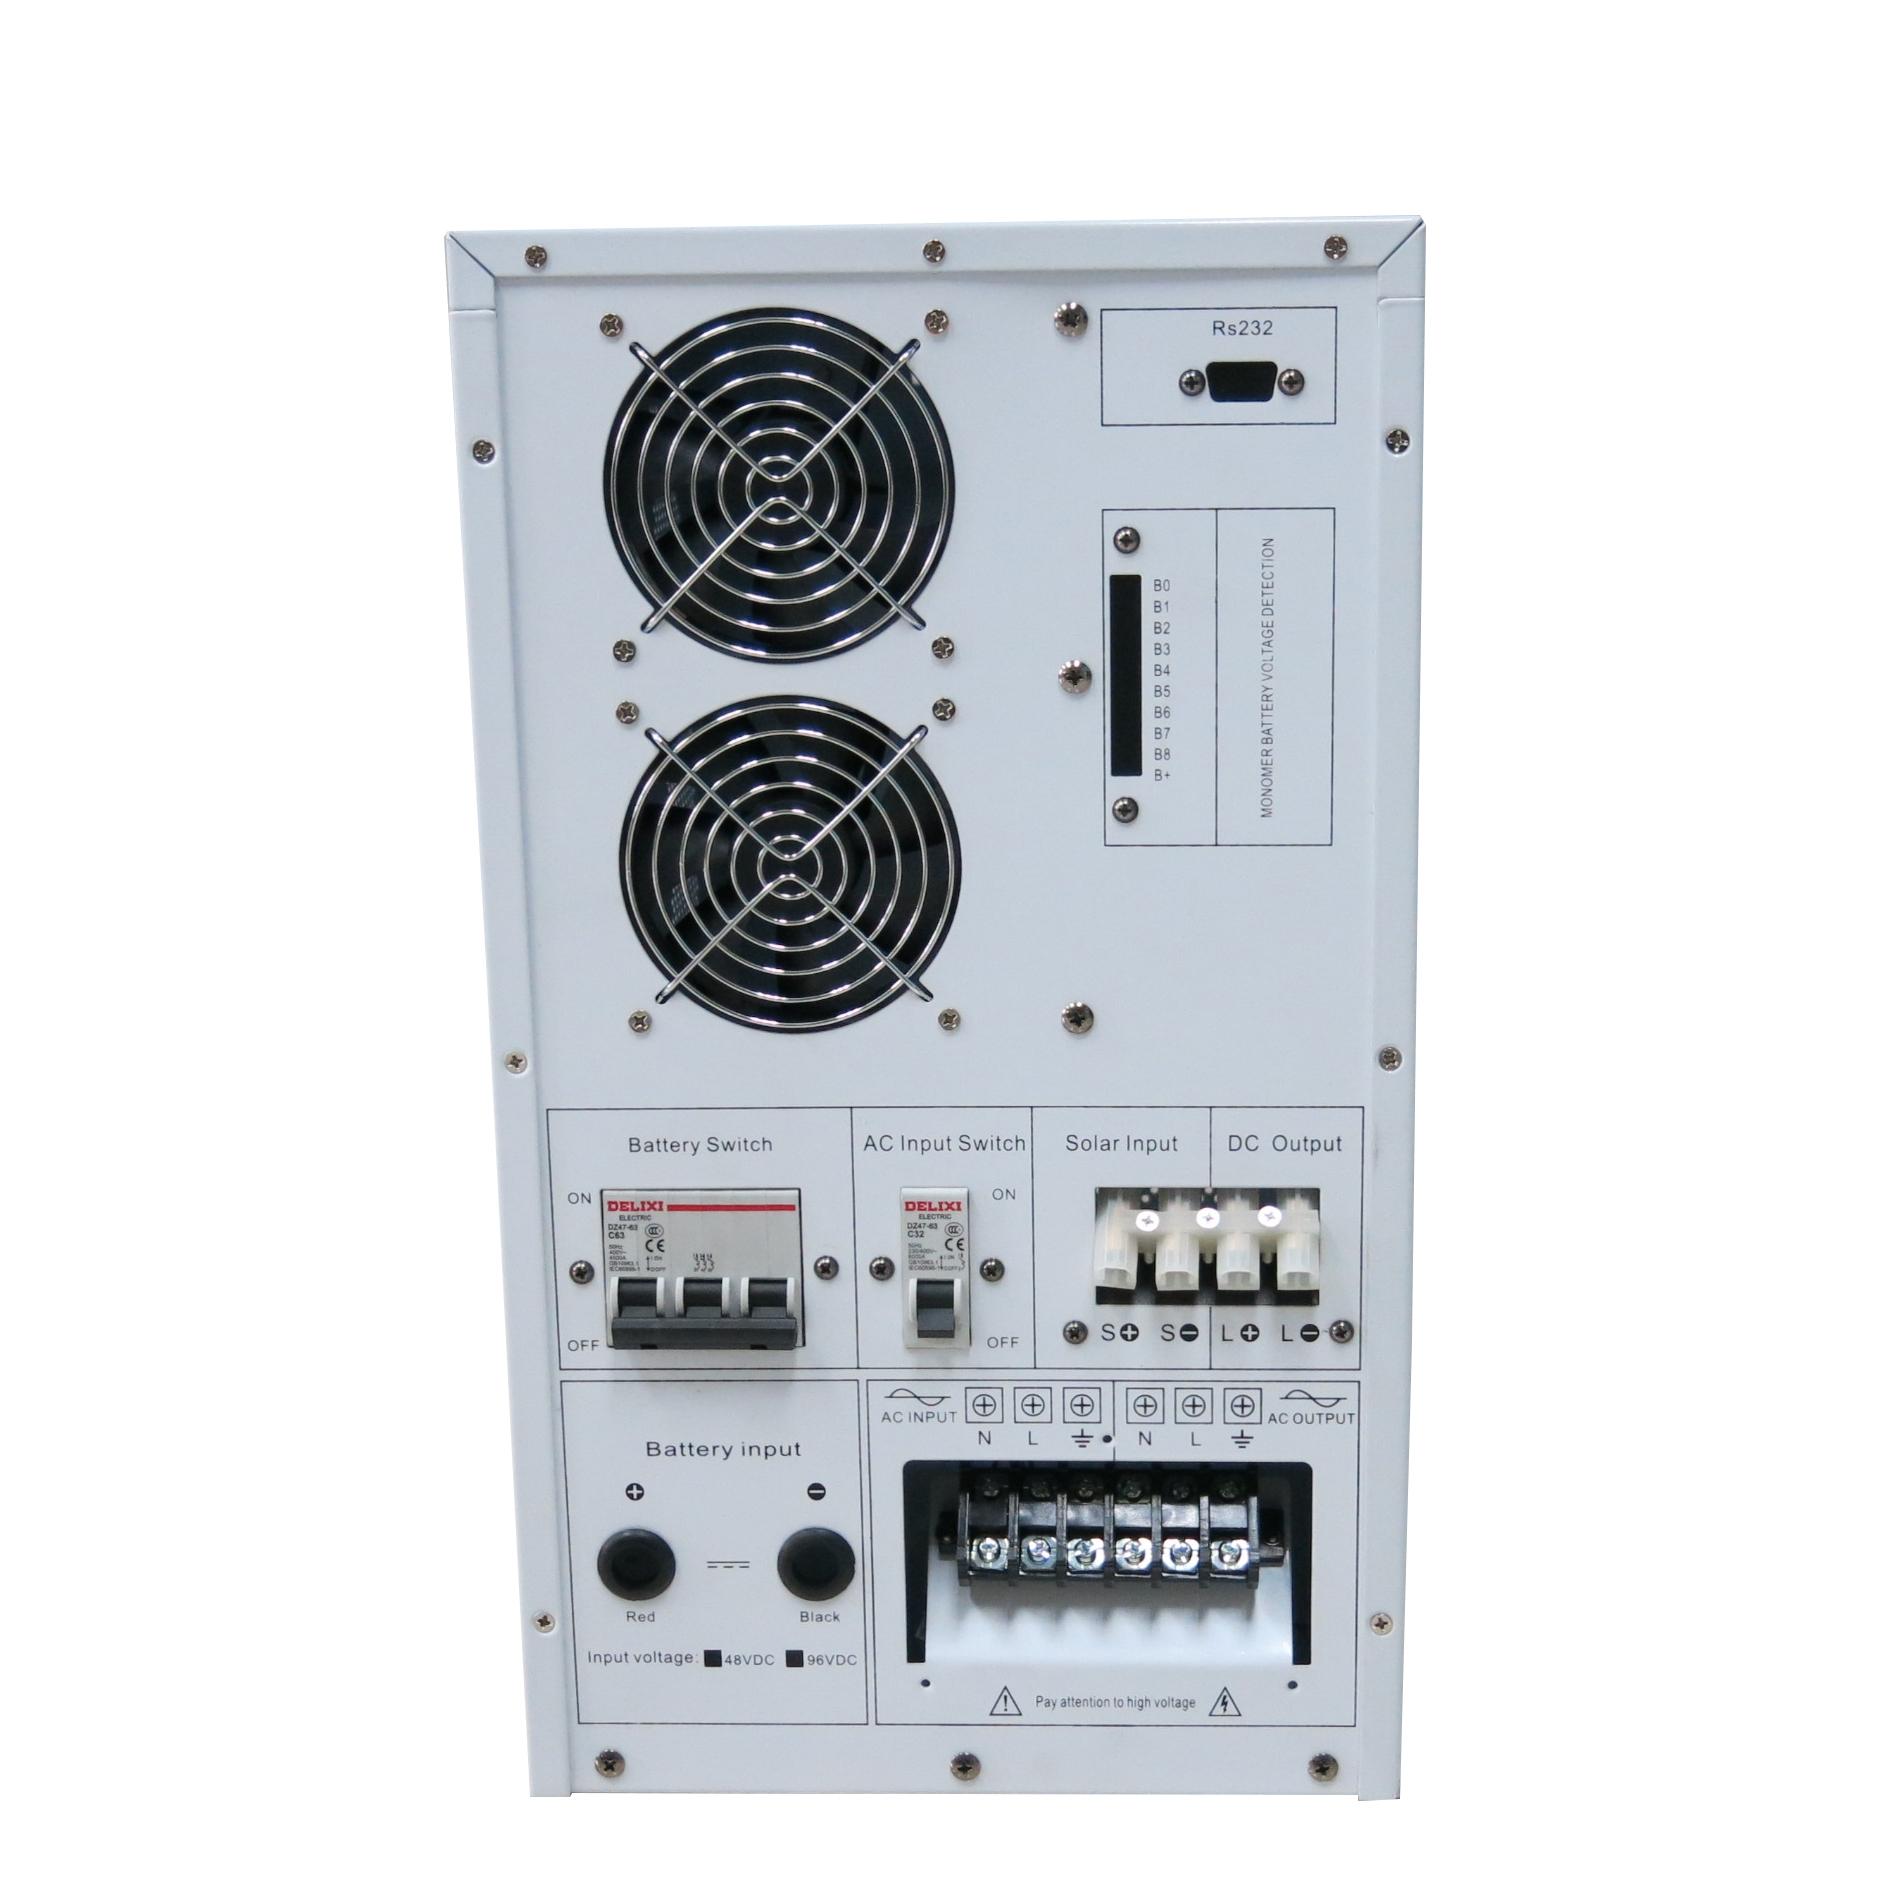 Dc 48v Bis 220v Ac 230v 240v 4kw Einphasig Und Off Grid Dc